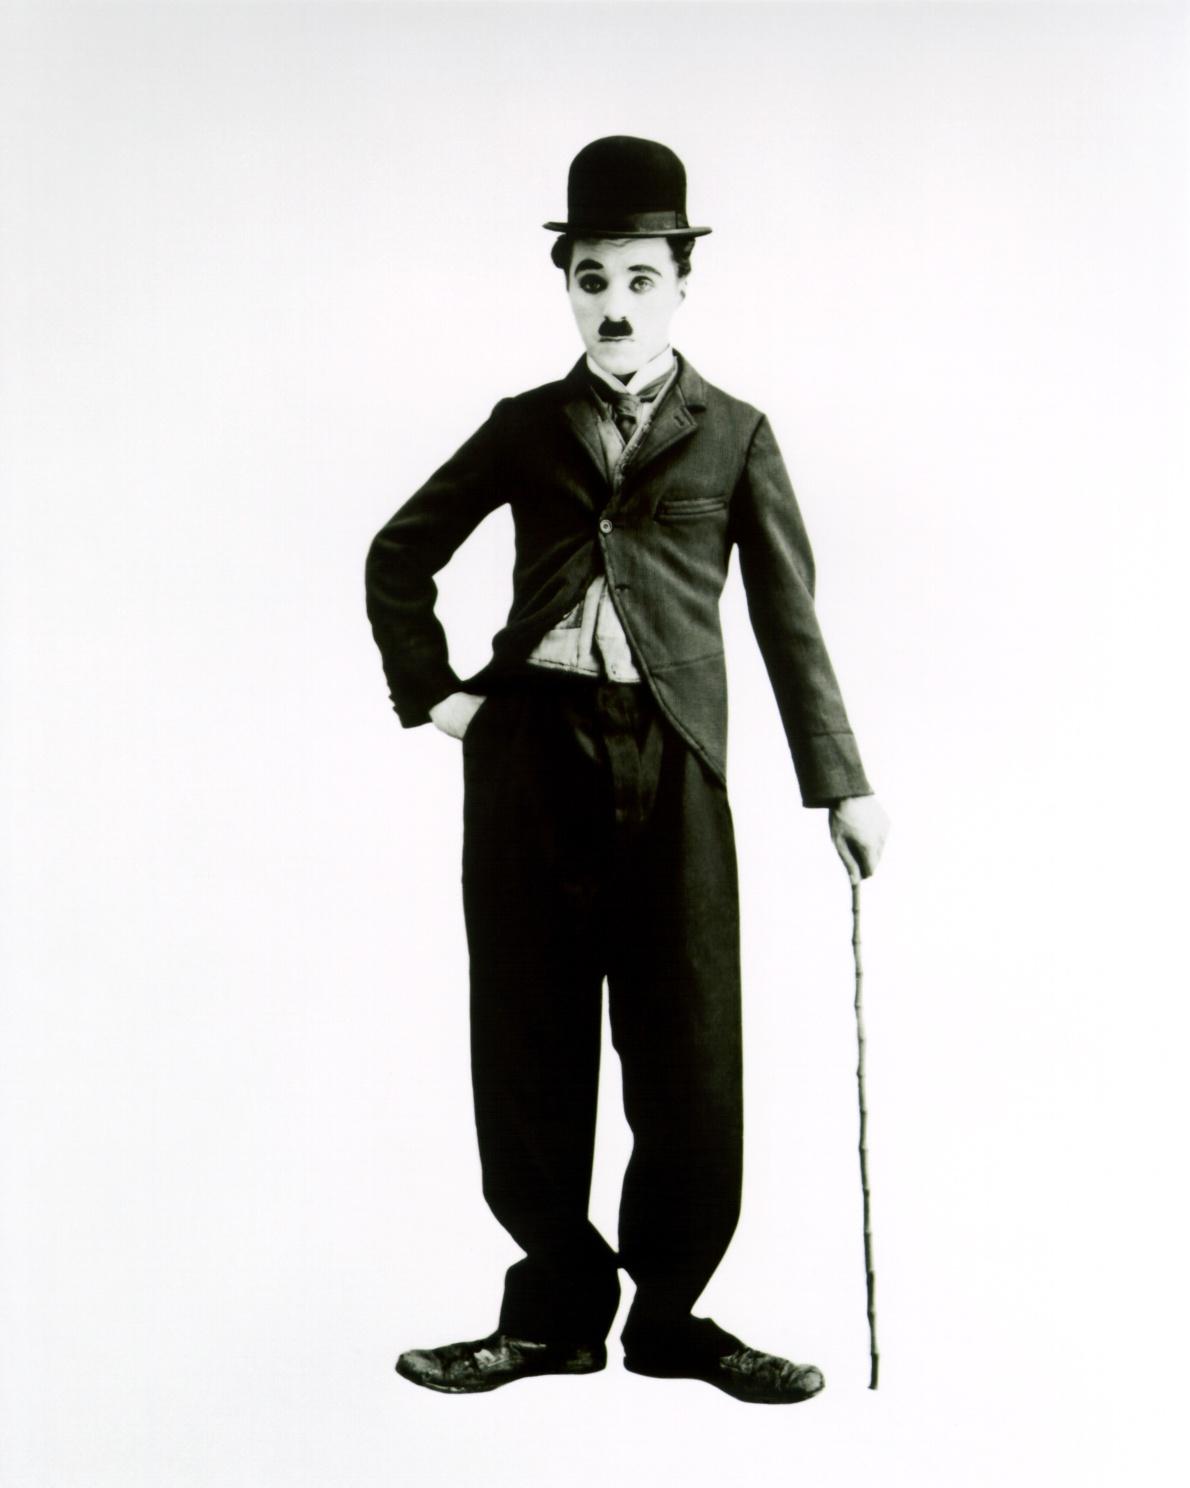 Charlie Chaplin as The Tramp